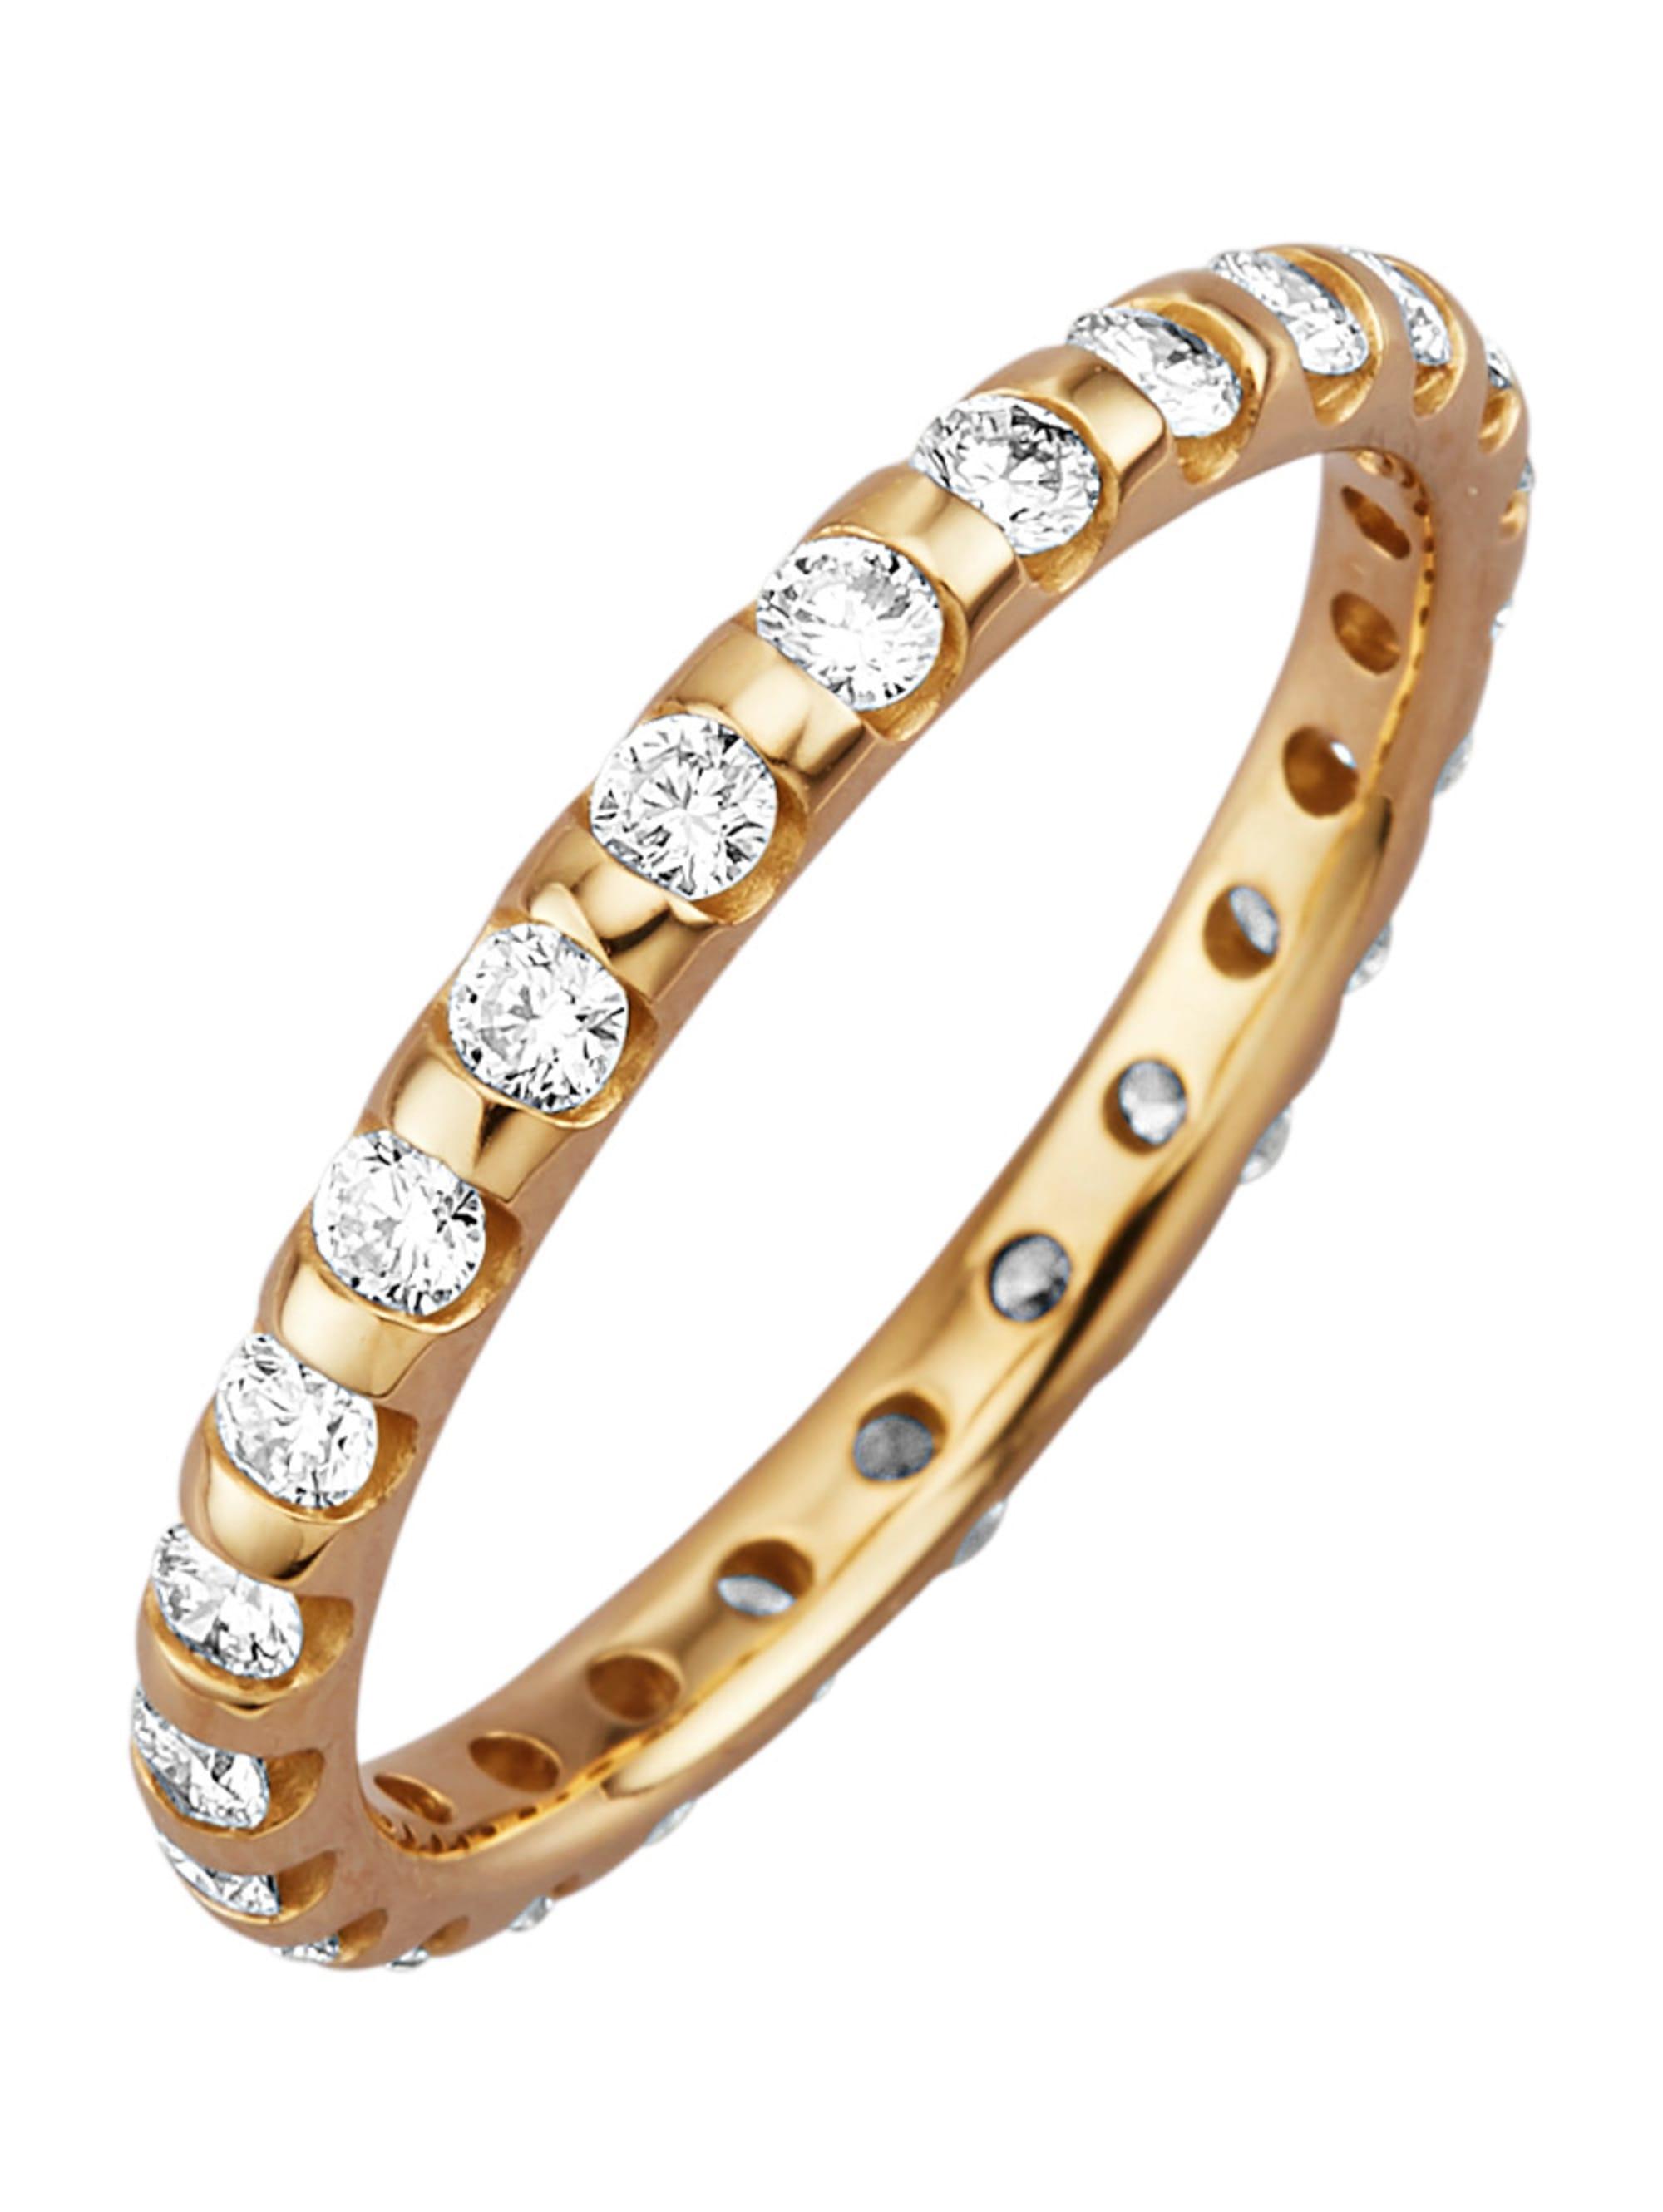 Diemer Diamant Memoirering mit Brillanten HA0wx